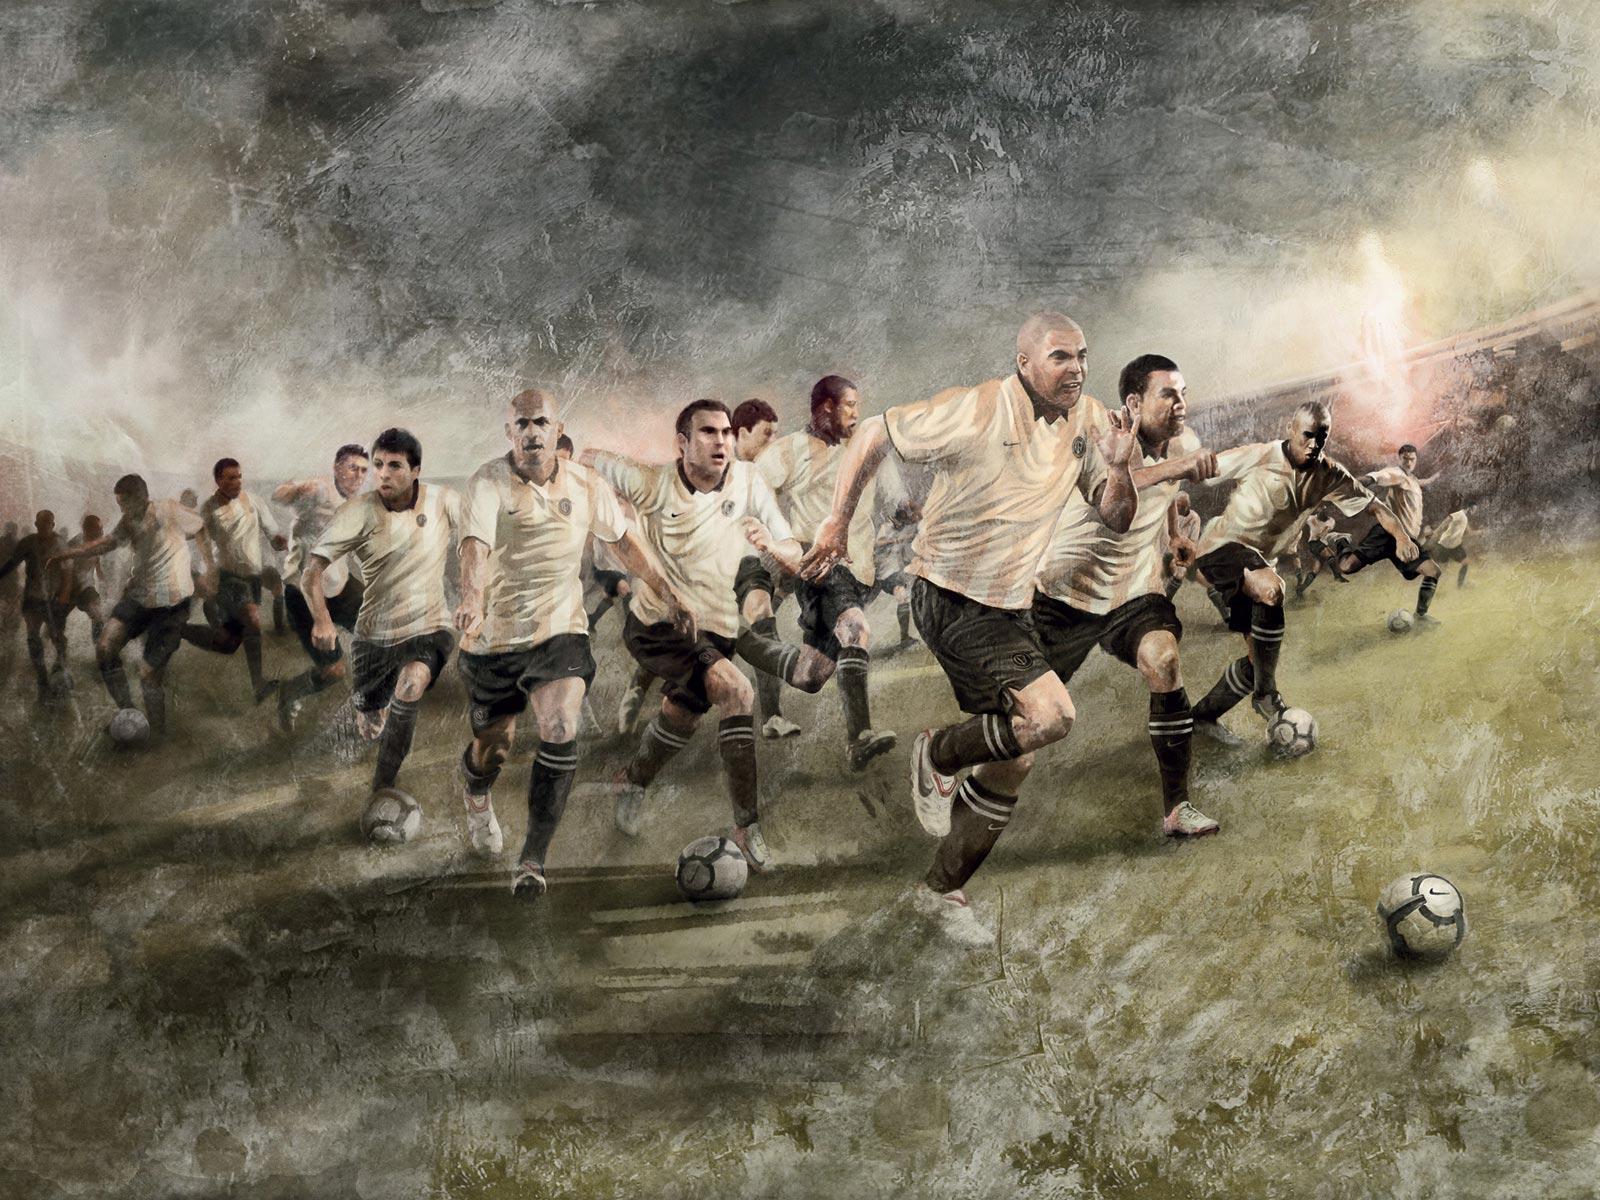 poster_nike-equipe_em_combate_v2_1600x1200